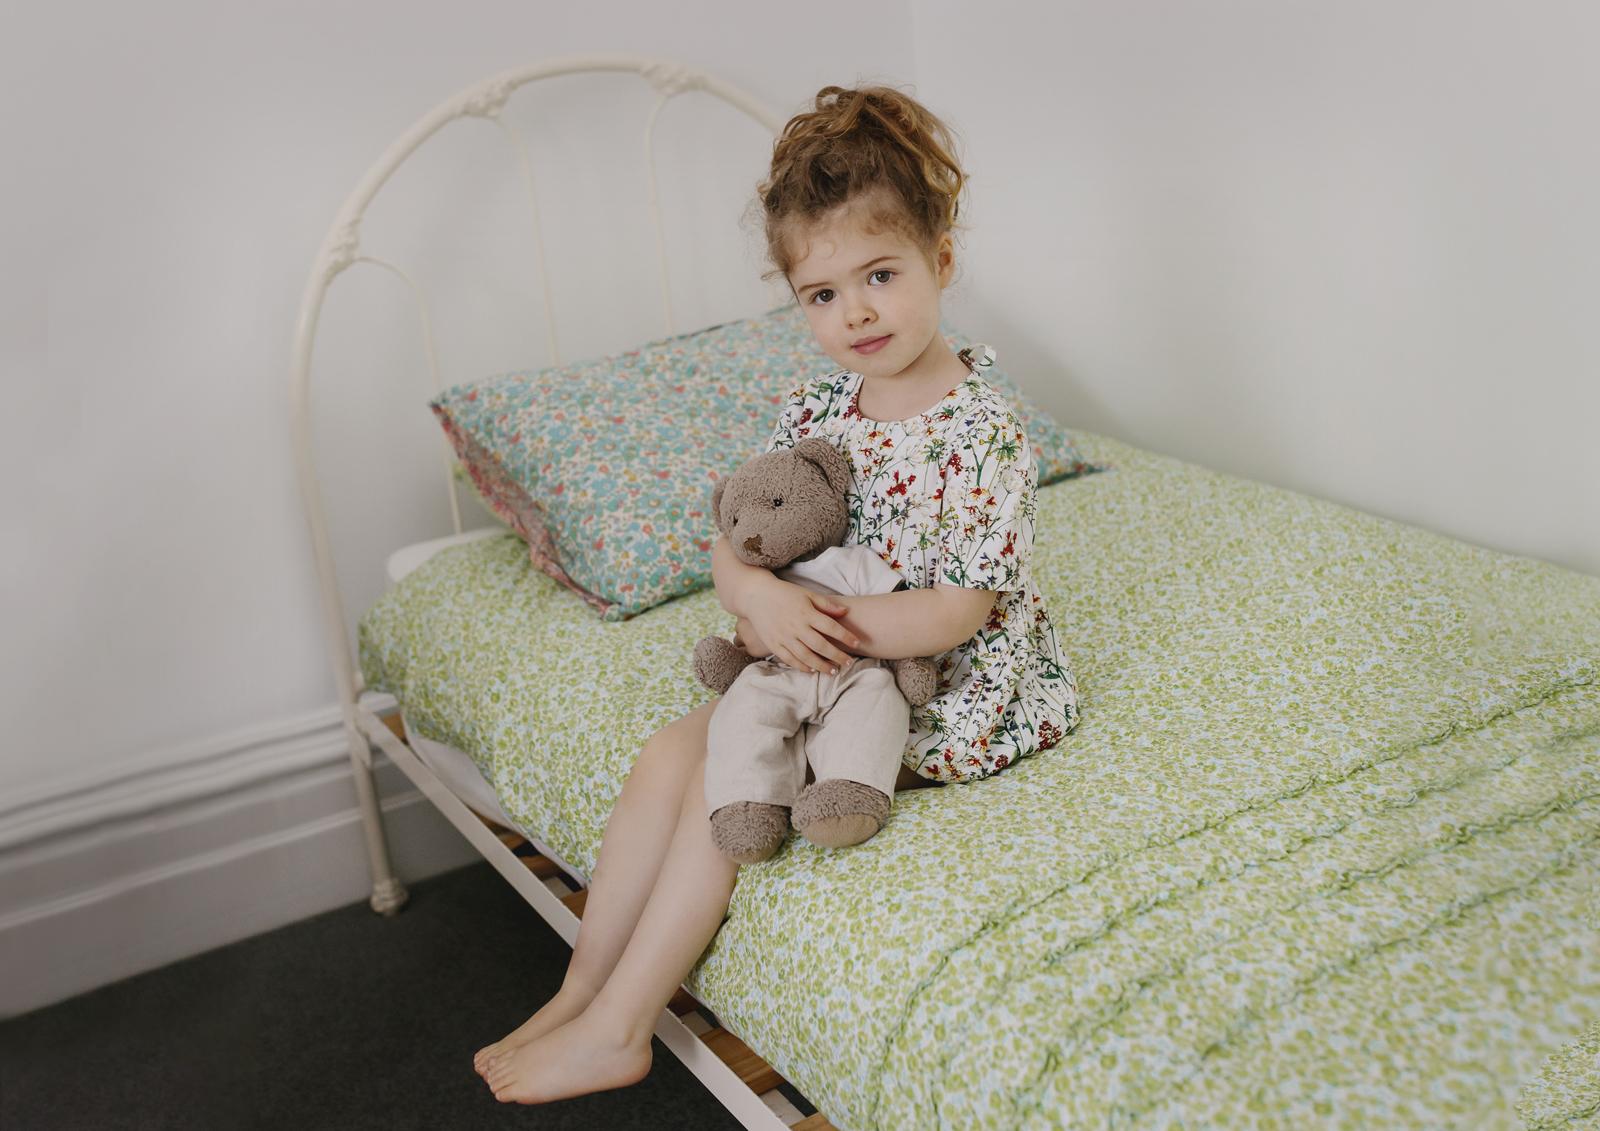 Child sitting on her vintage bed